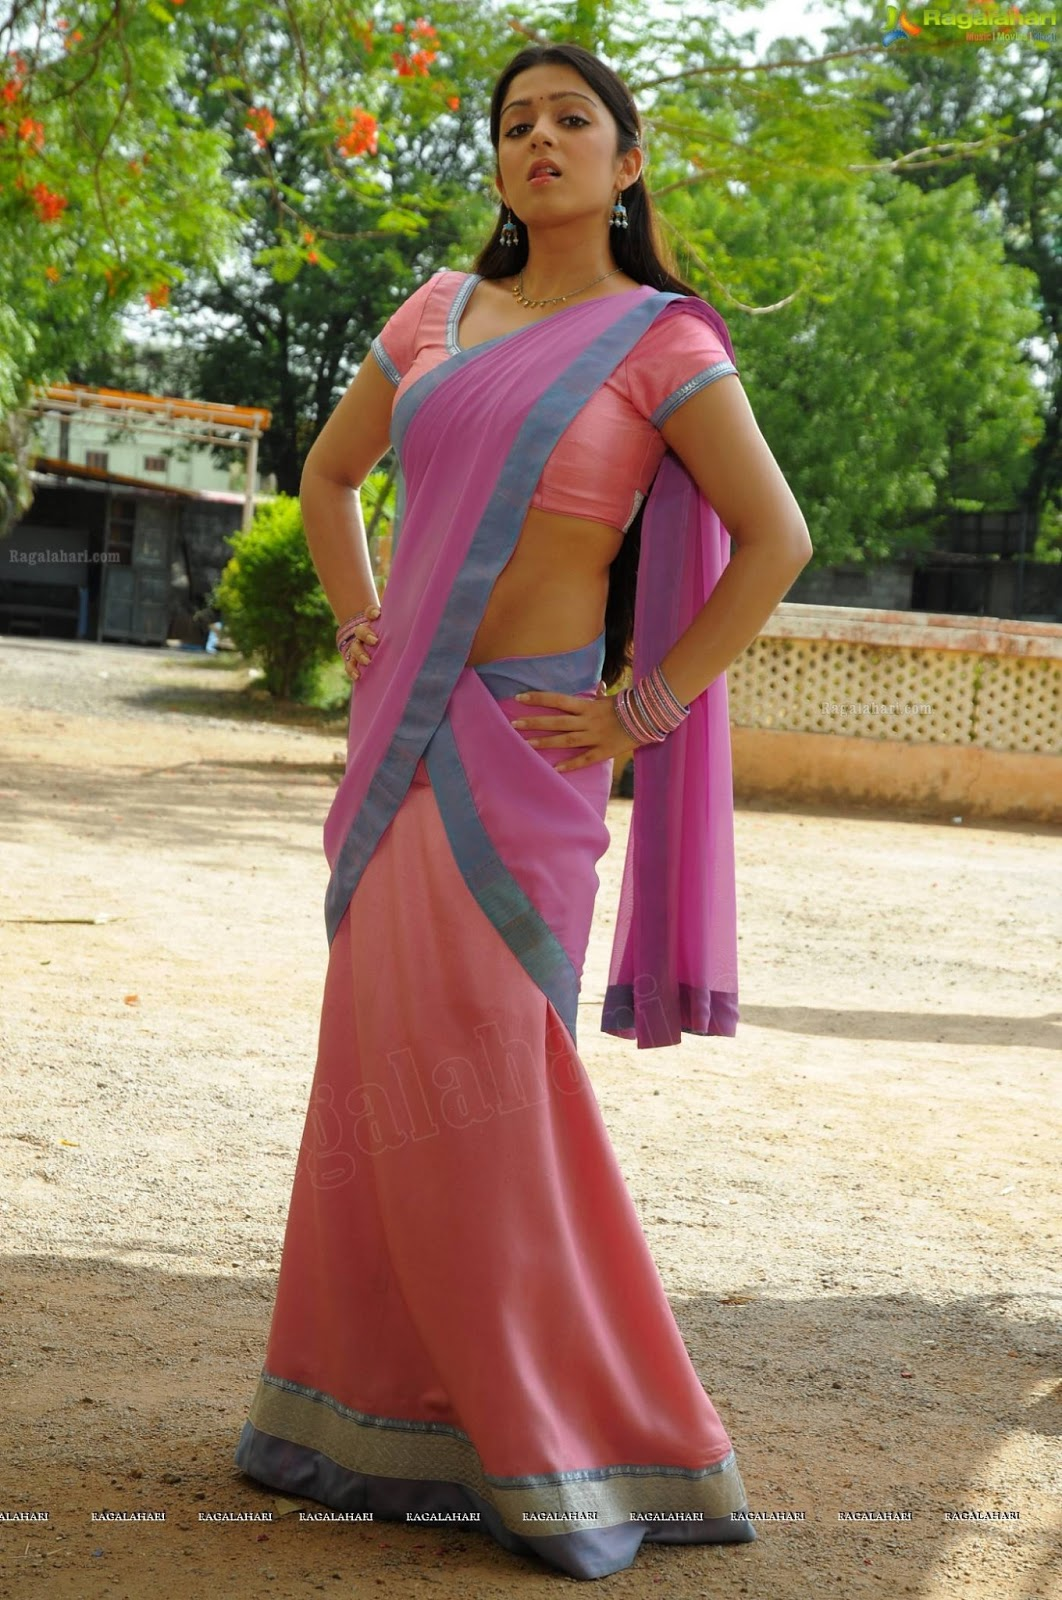 Charmi Kaur In Saree - Side Poses Hot Stills - Sabwoodcom-1954